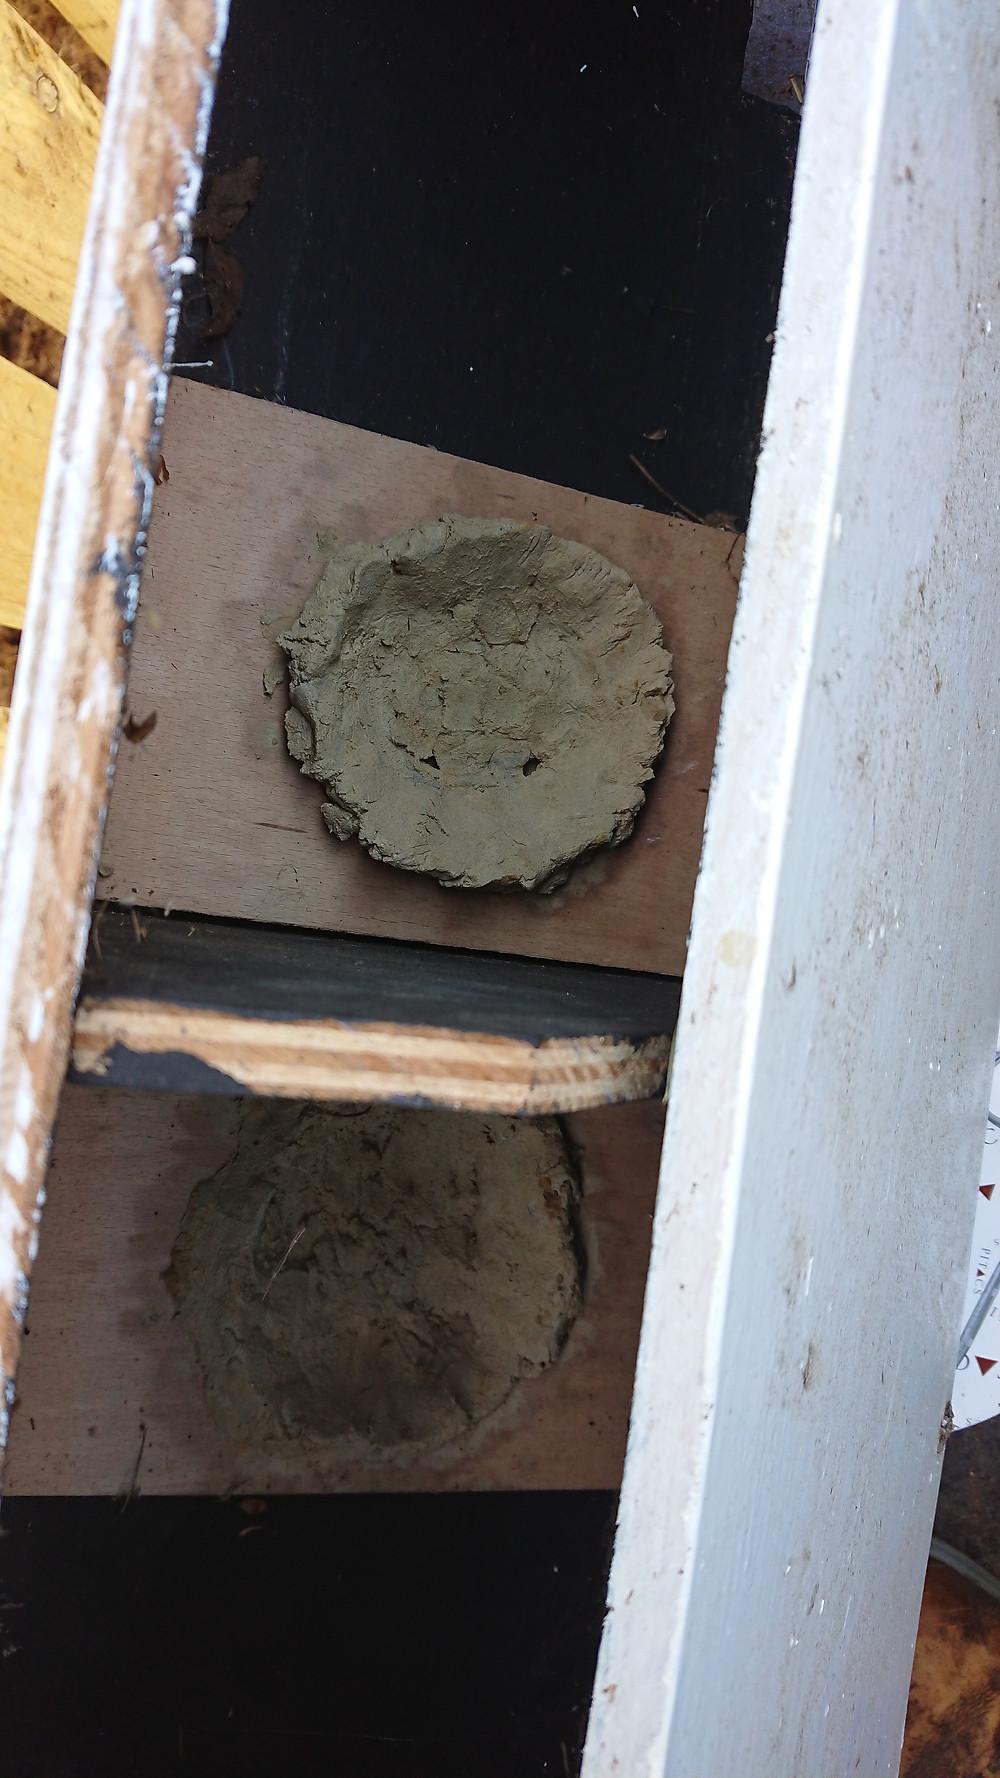 Cement next cups inside